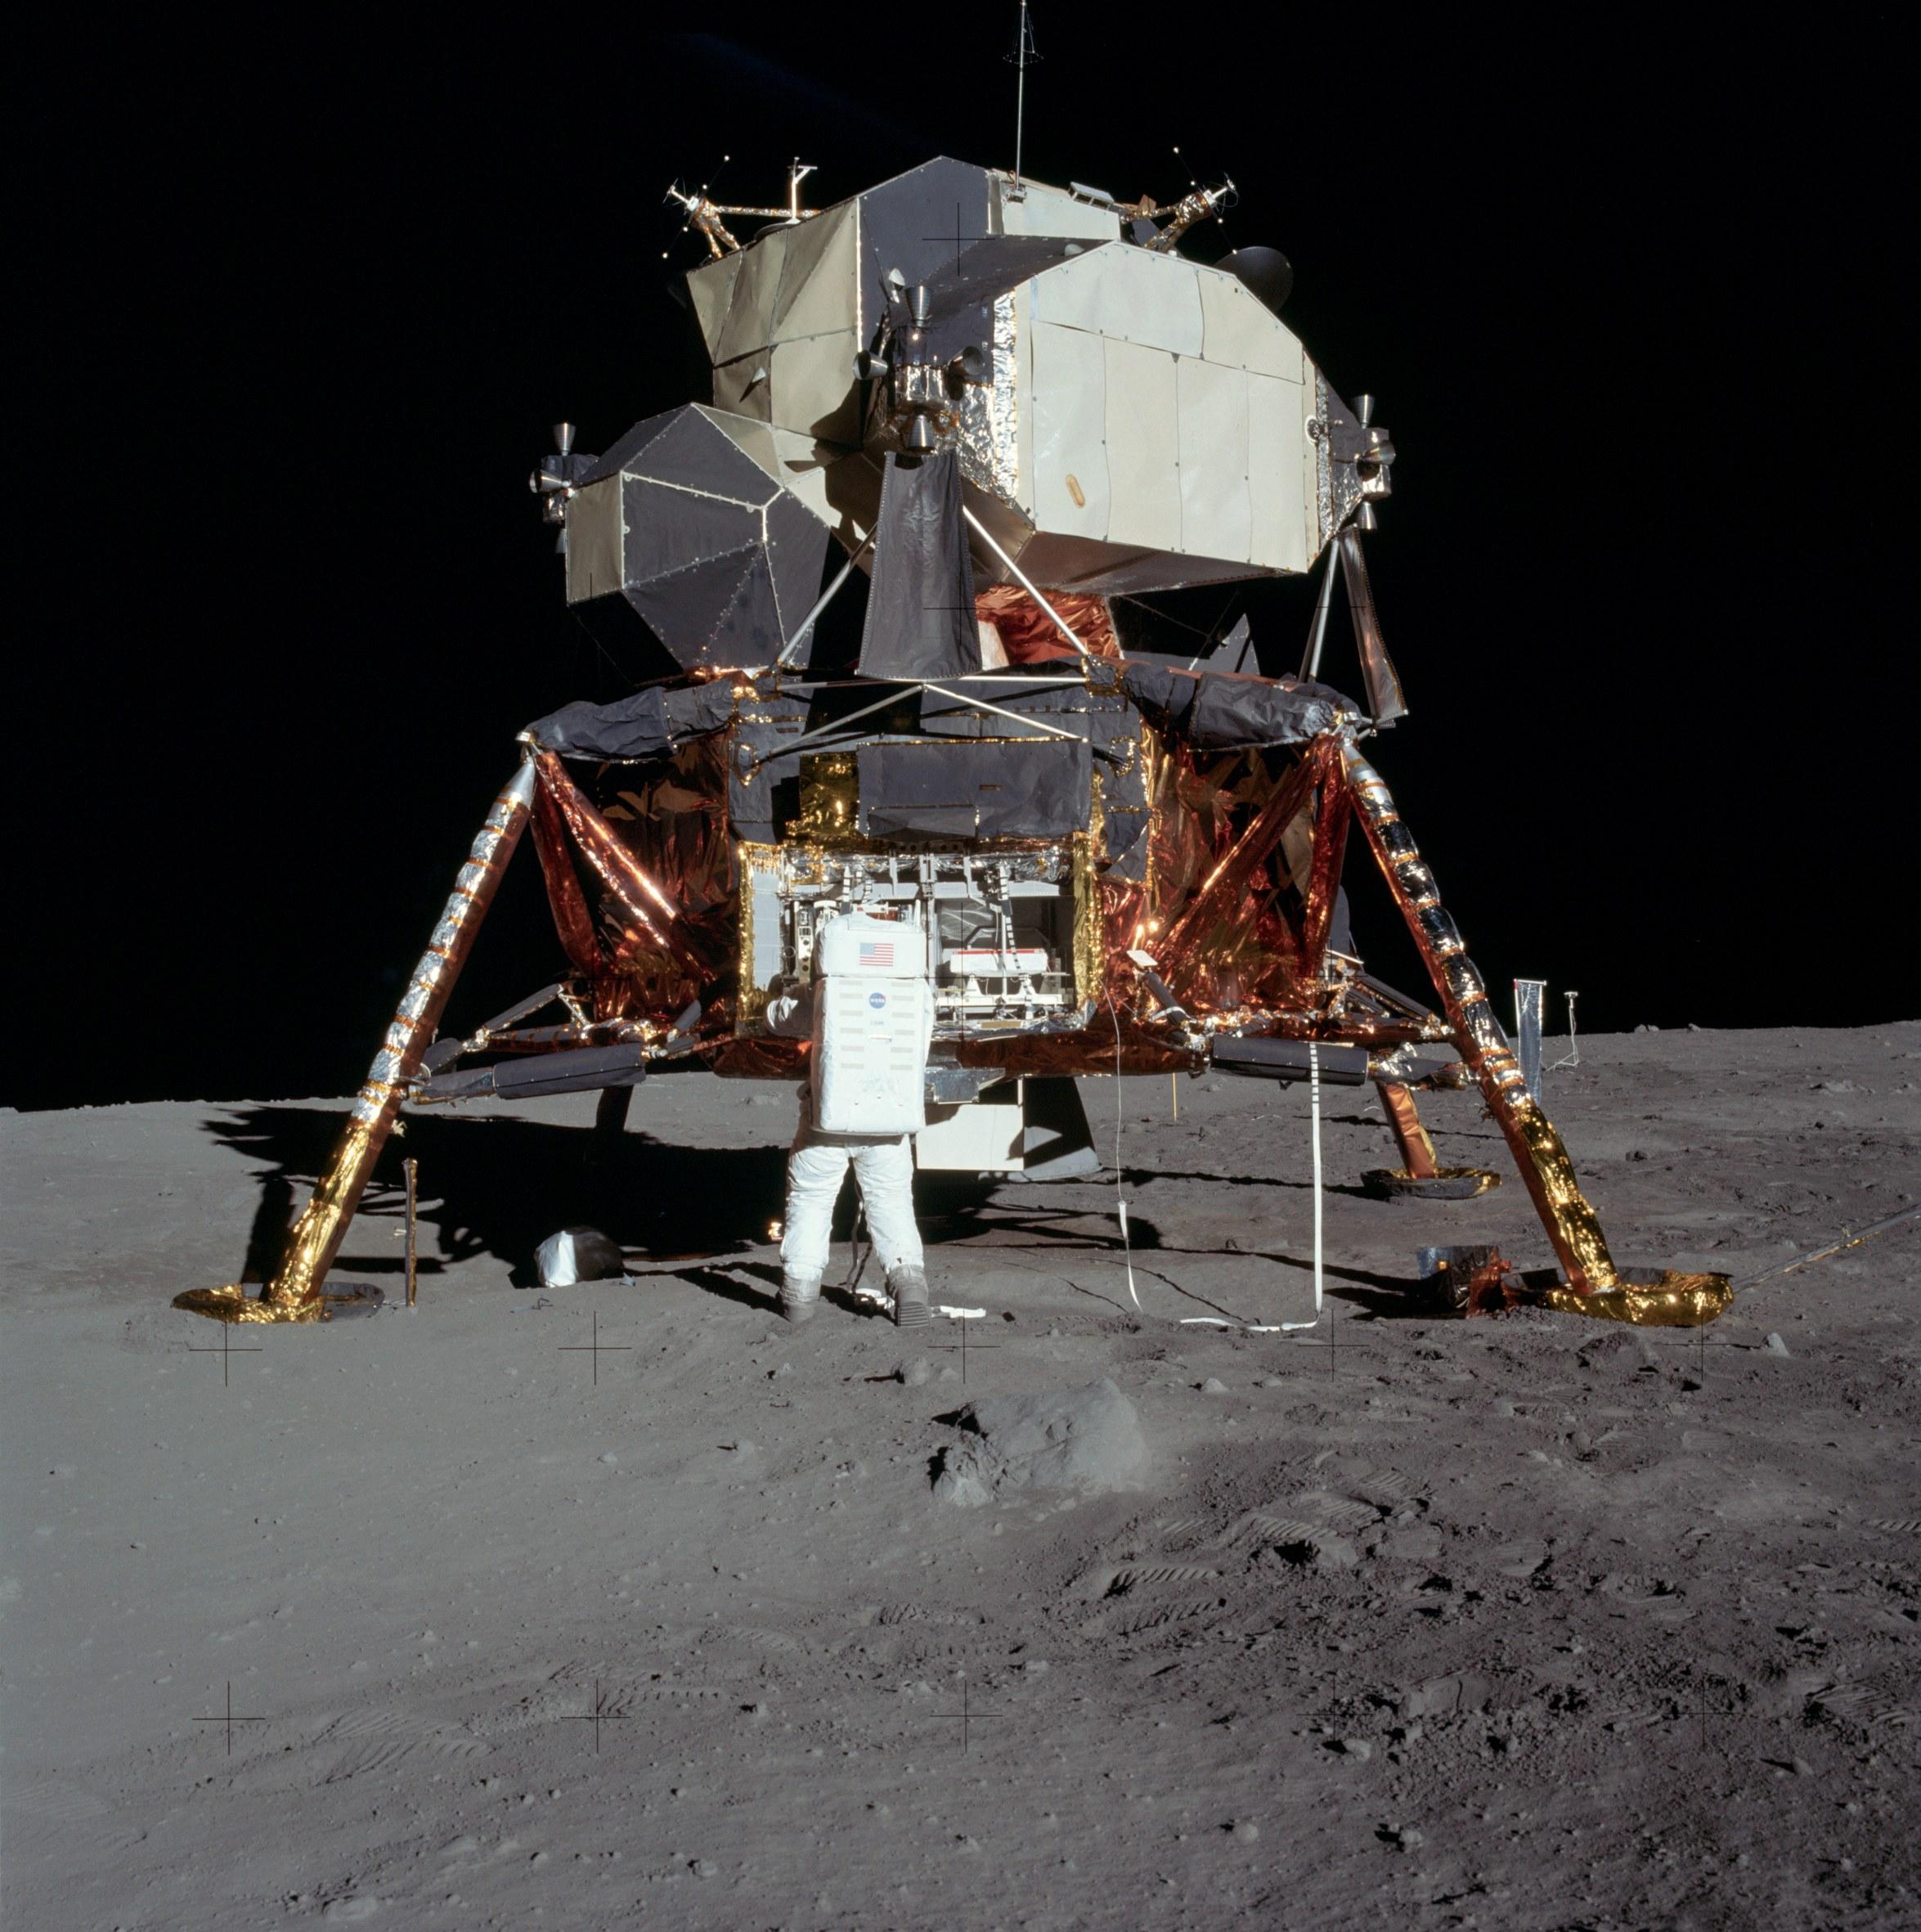 Datei:Apollo 11 Lunar Lander - 5927 NASA.jpg – Wikipedia